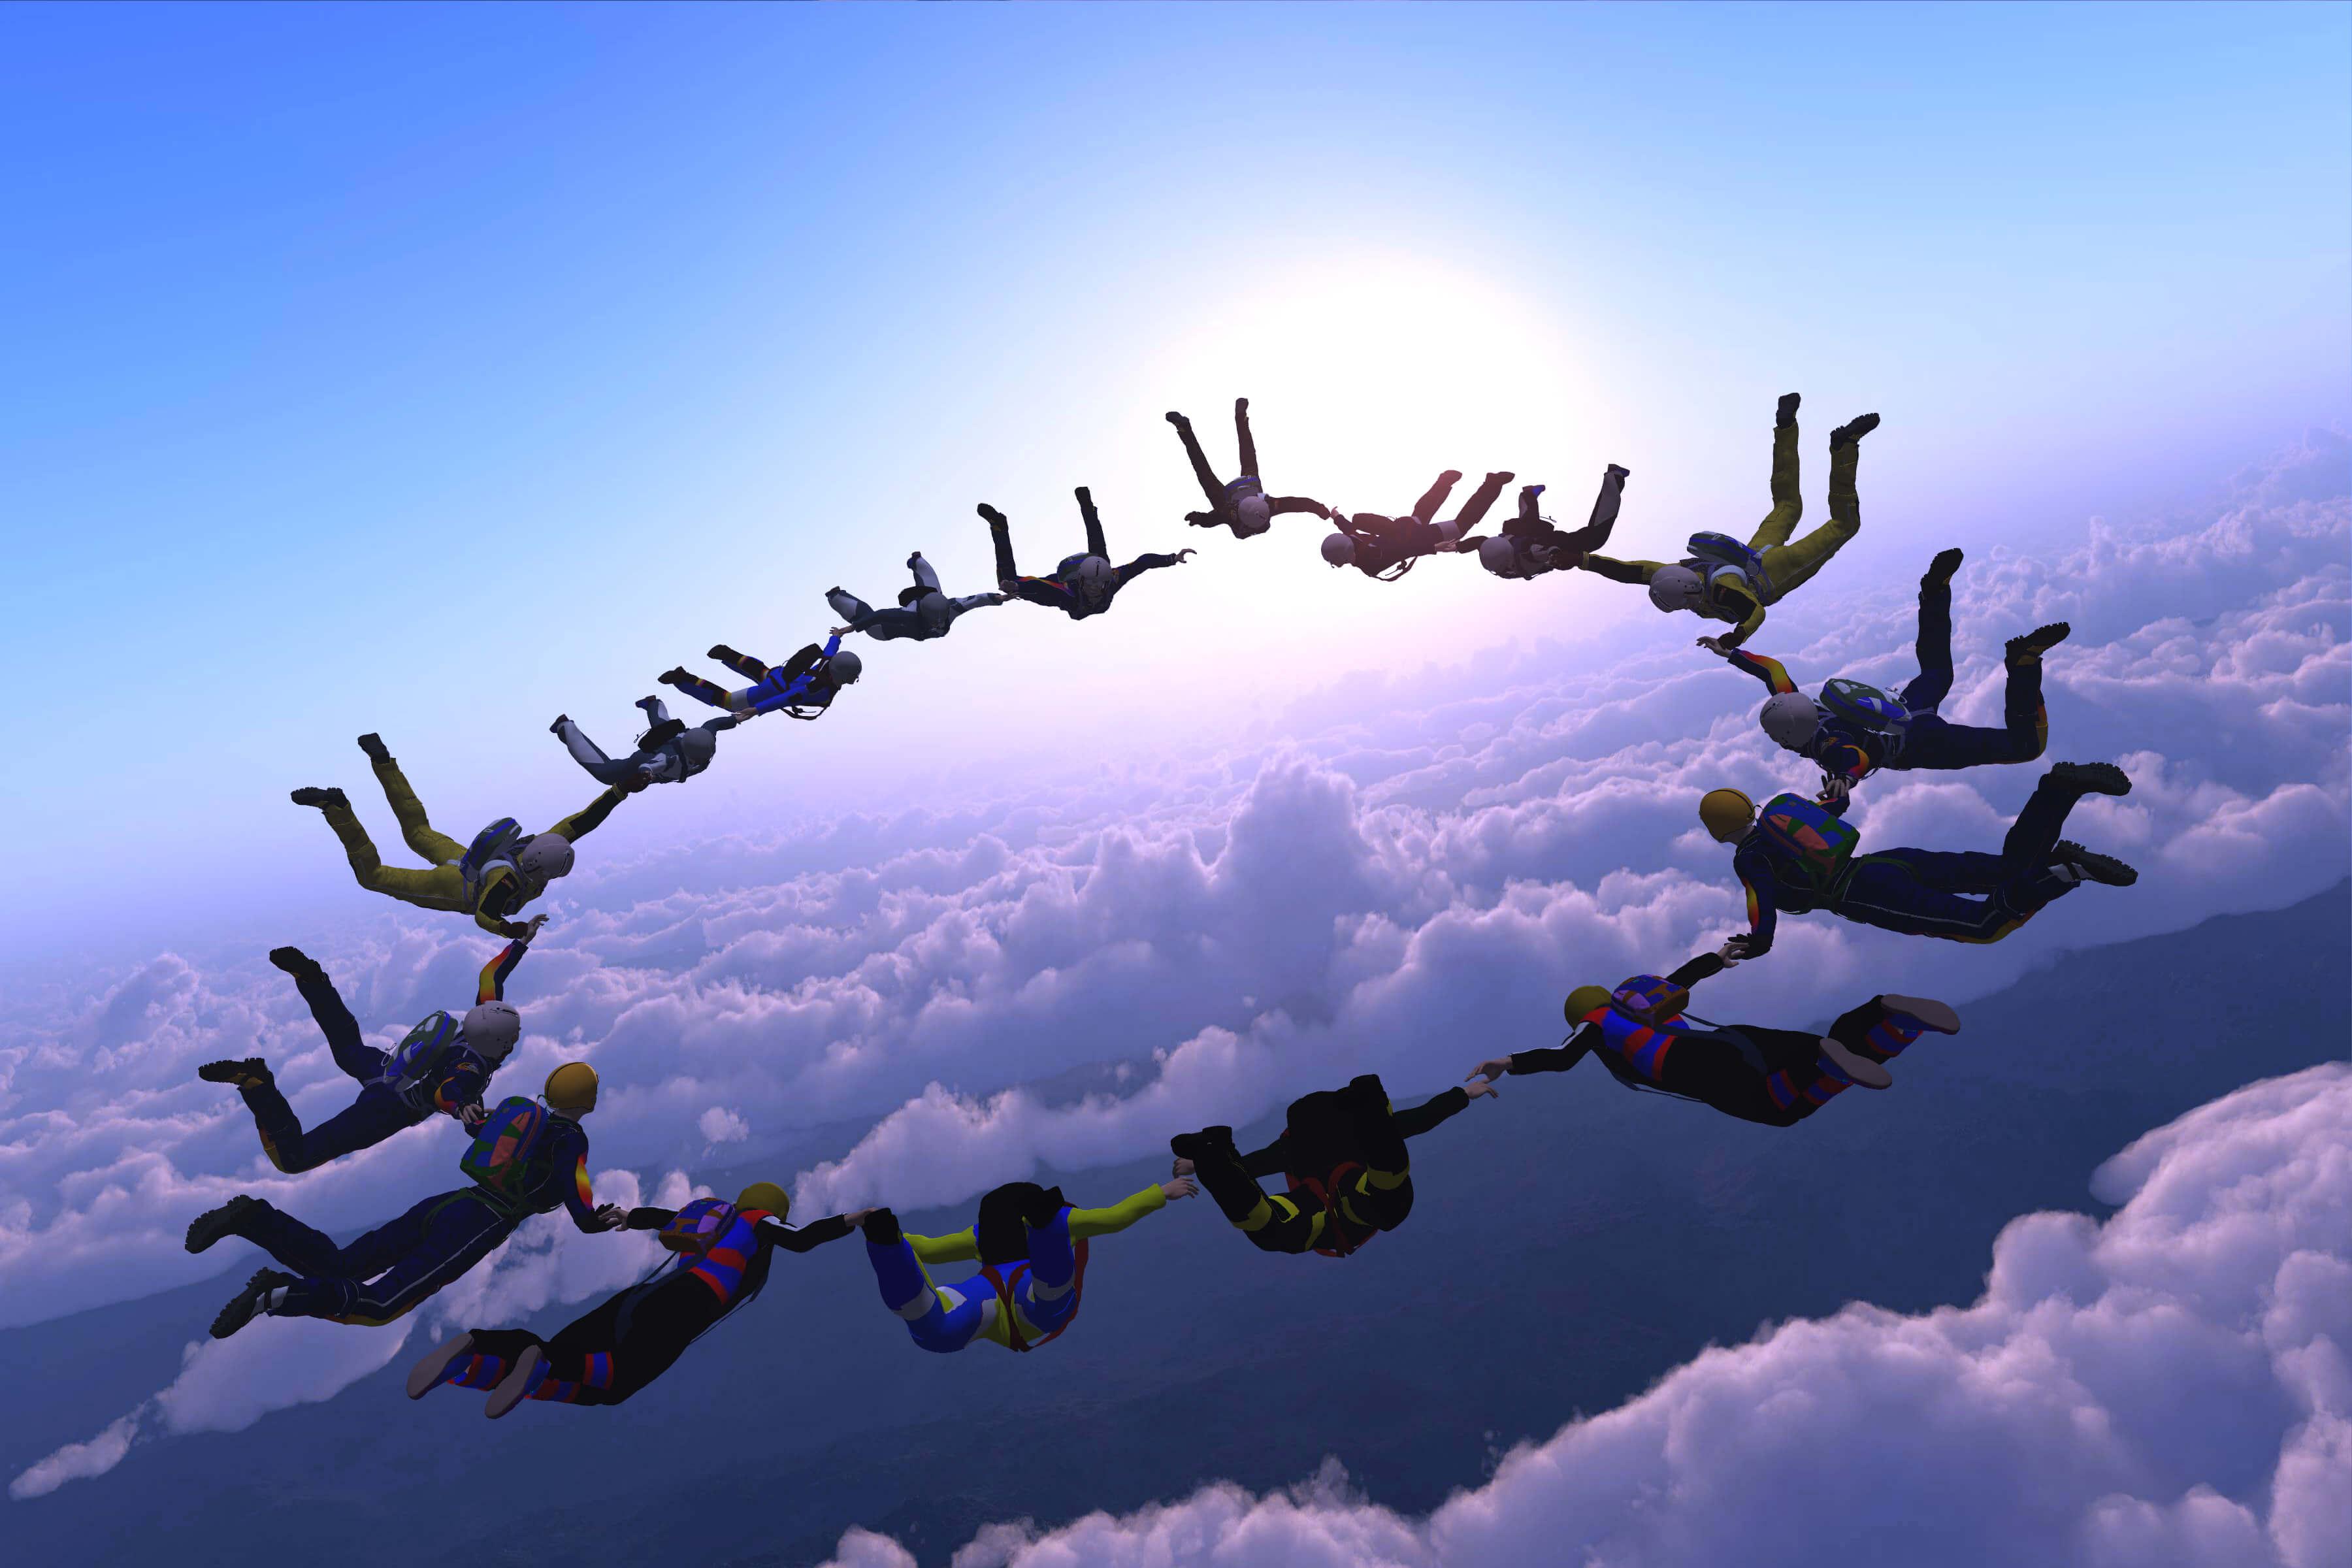 hazardous activity, skydiving,